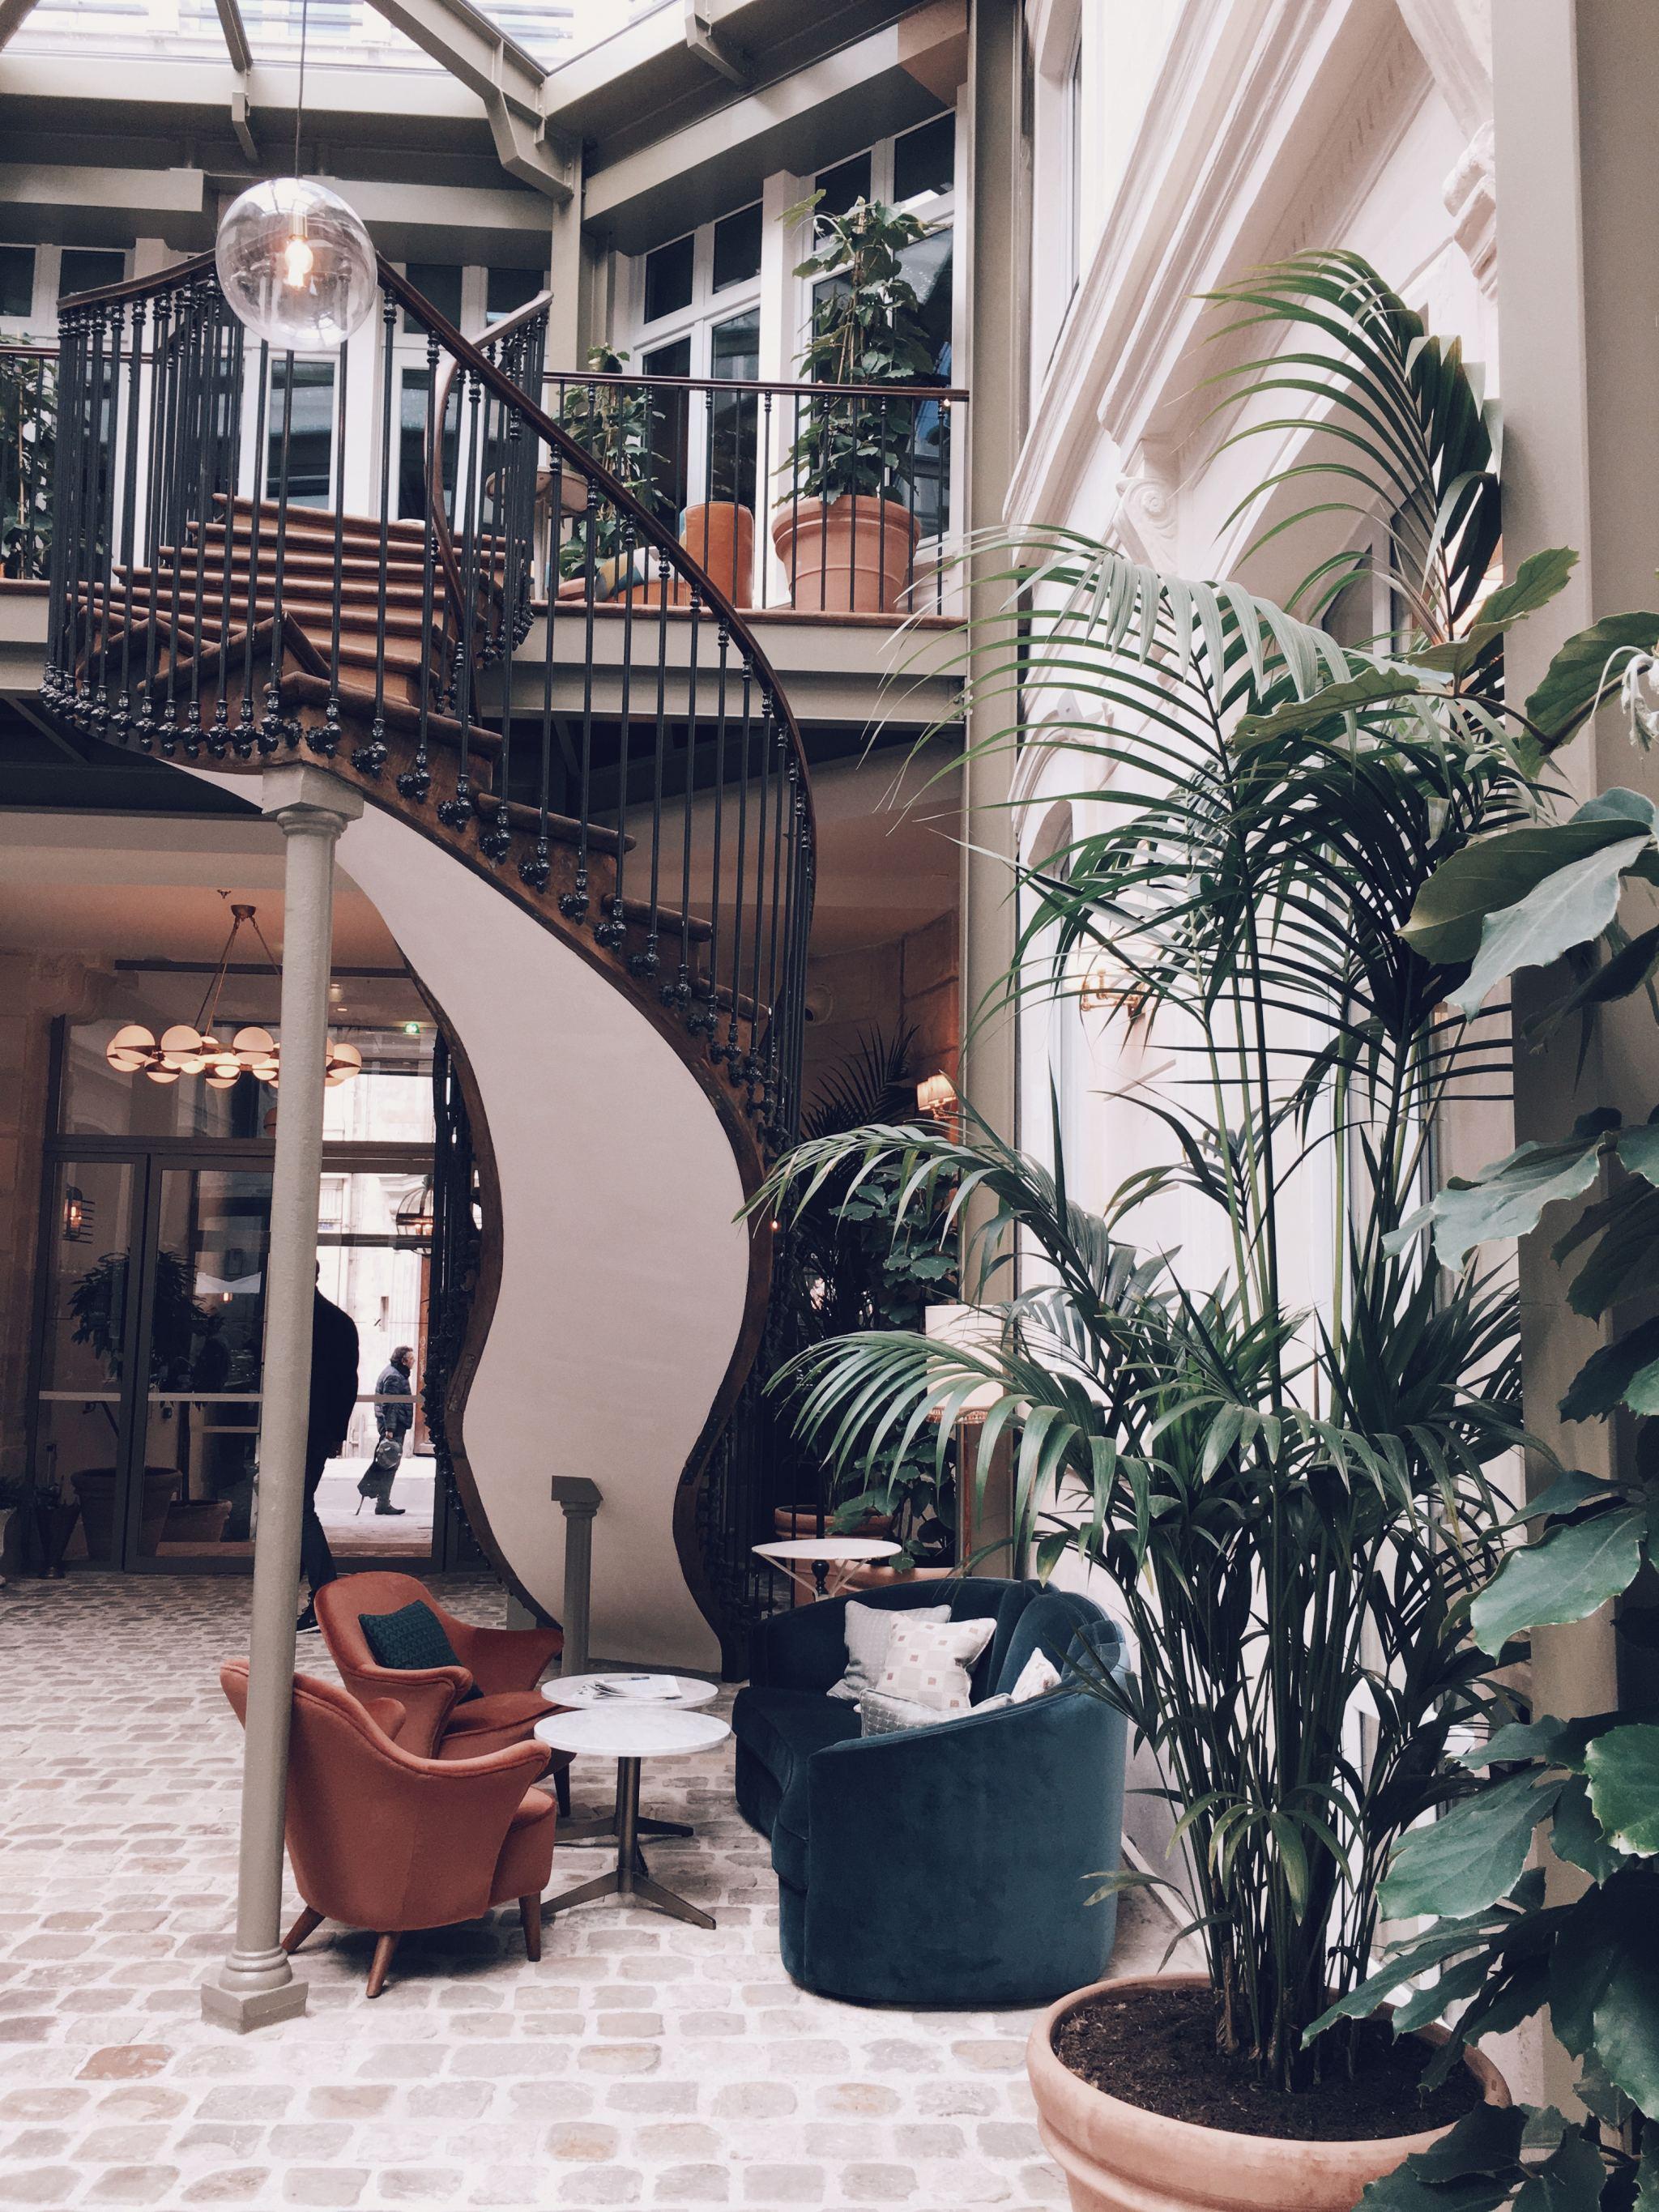 COCOA CHELSEA paris wallis hoxton hotel goals